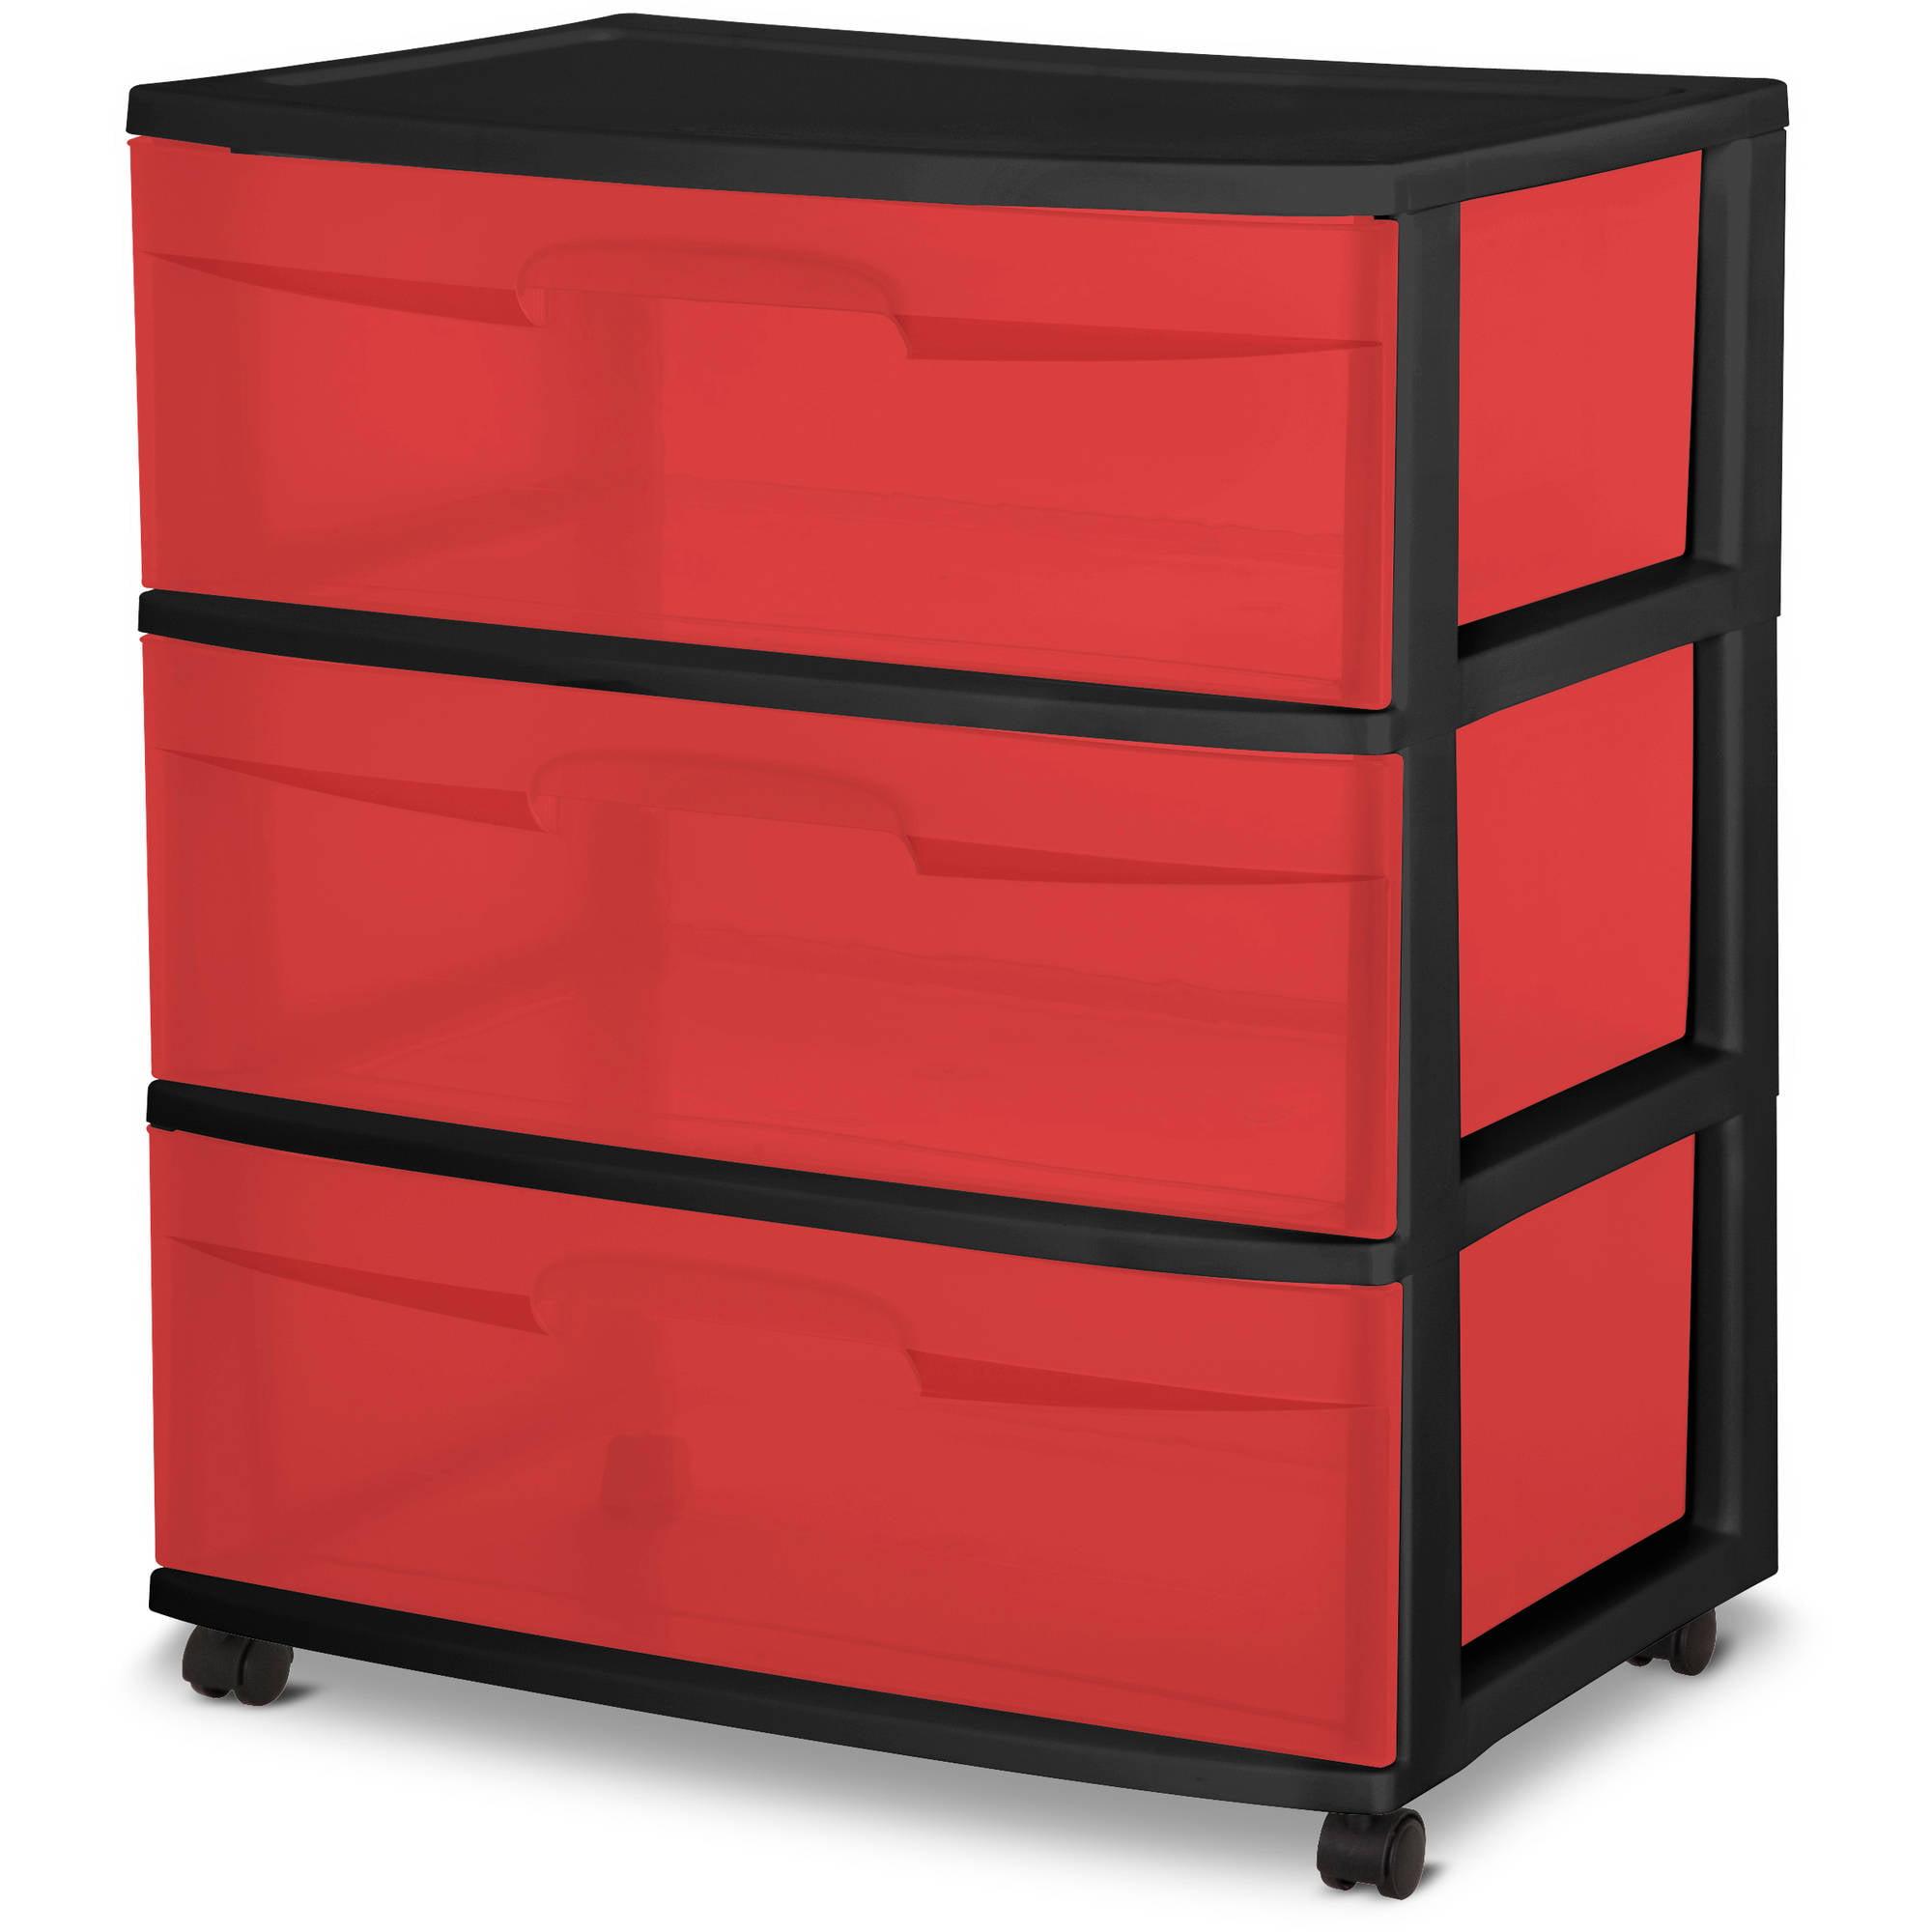 High Quality Sterilite 3 Drawer Wide Cart, Fearless Red Tint/Black Frame   Walmart.com